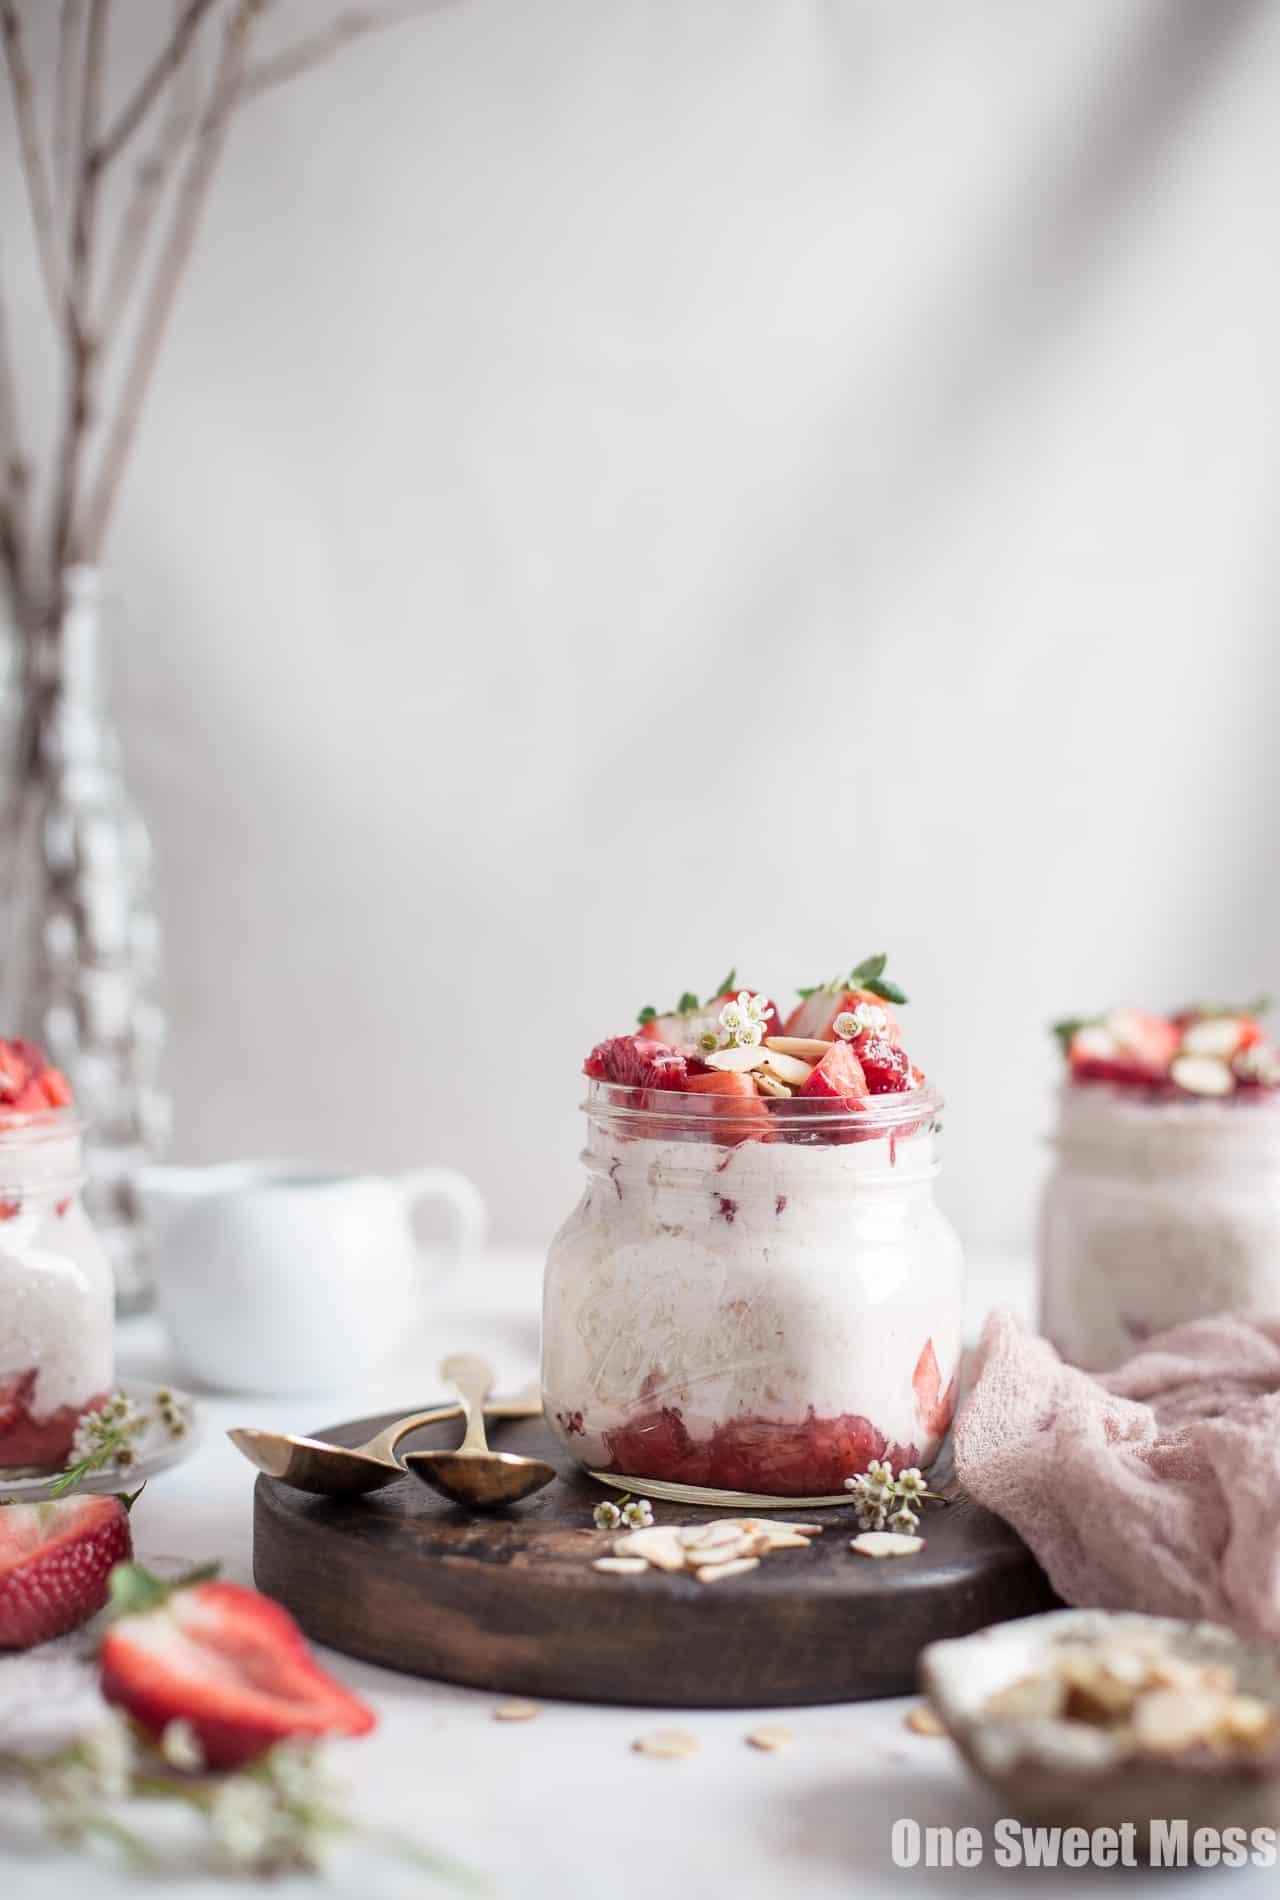 Strawberries and Cream Overnight Oatmeal {Gluten-Free + Vegan Option)